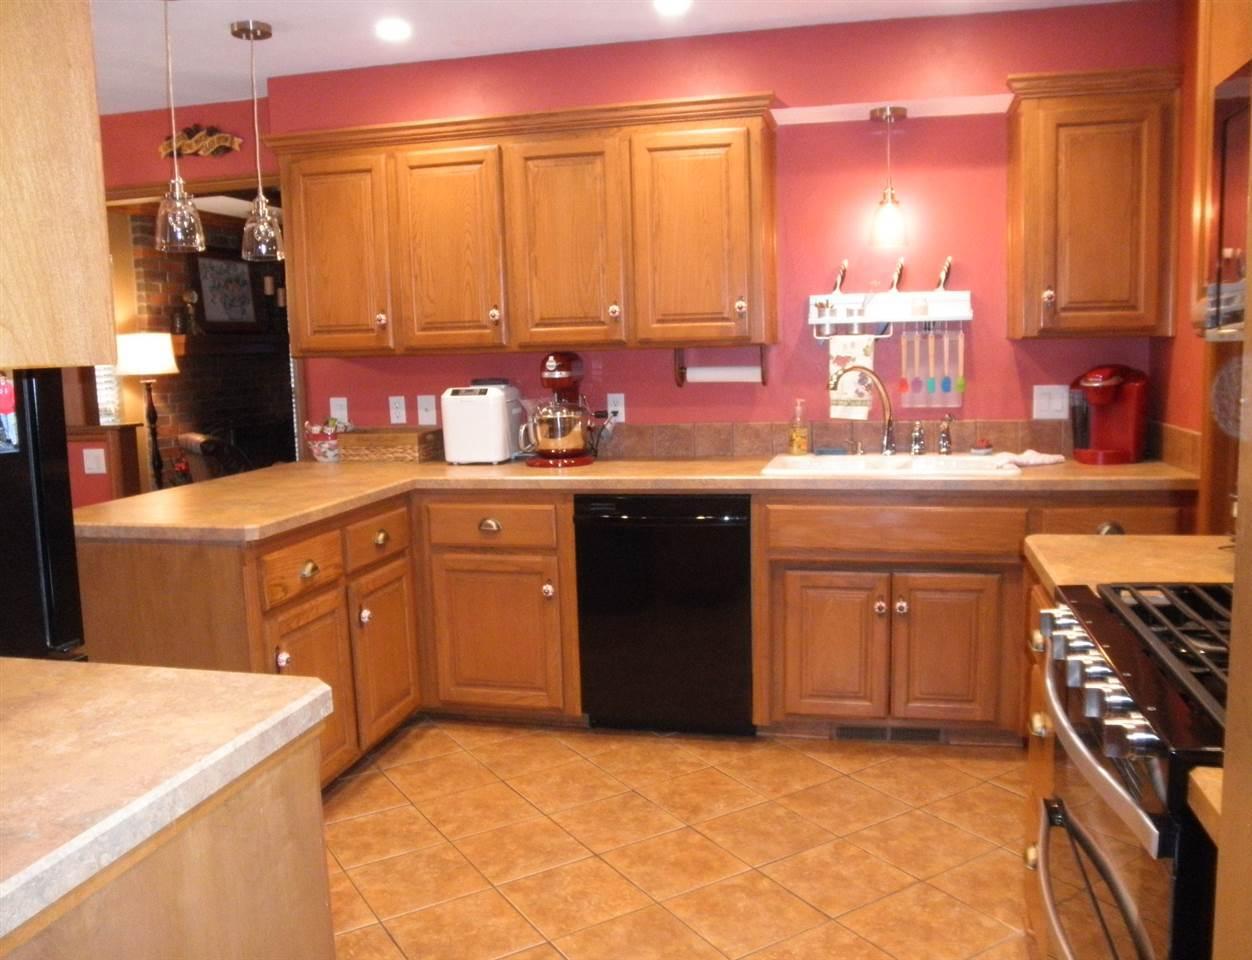 Sold Intraoffice W/MLS | 2800 Green Meadow Ponca City, OK 74604 9